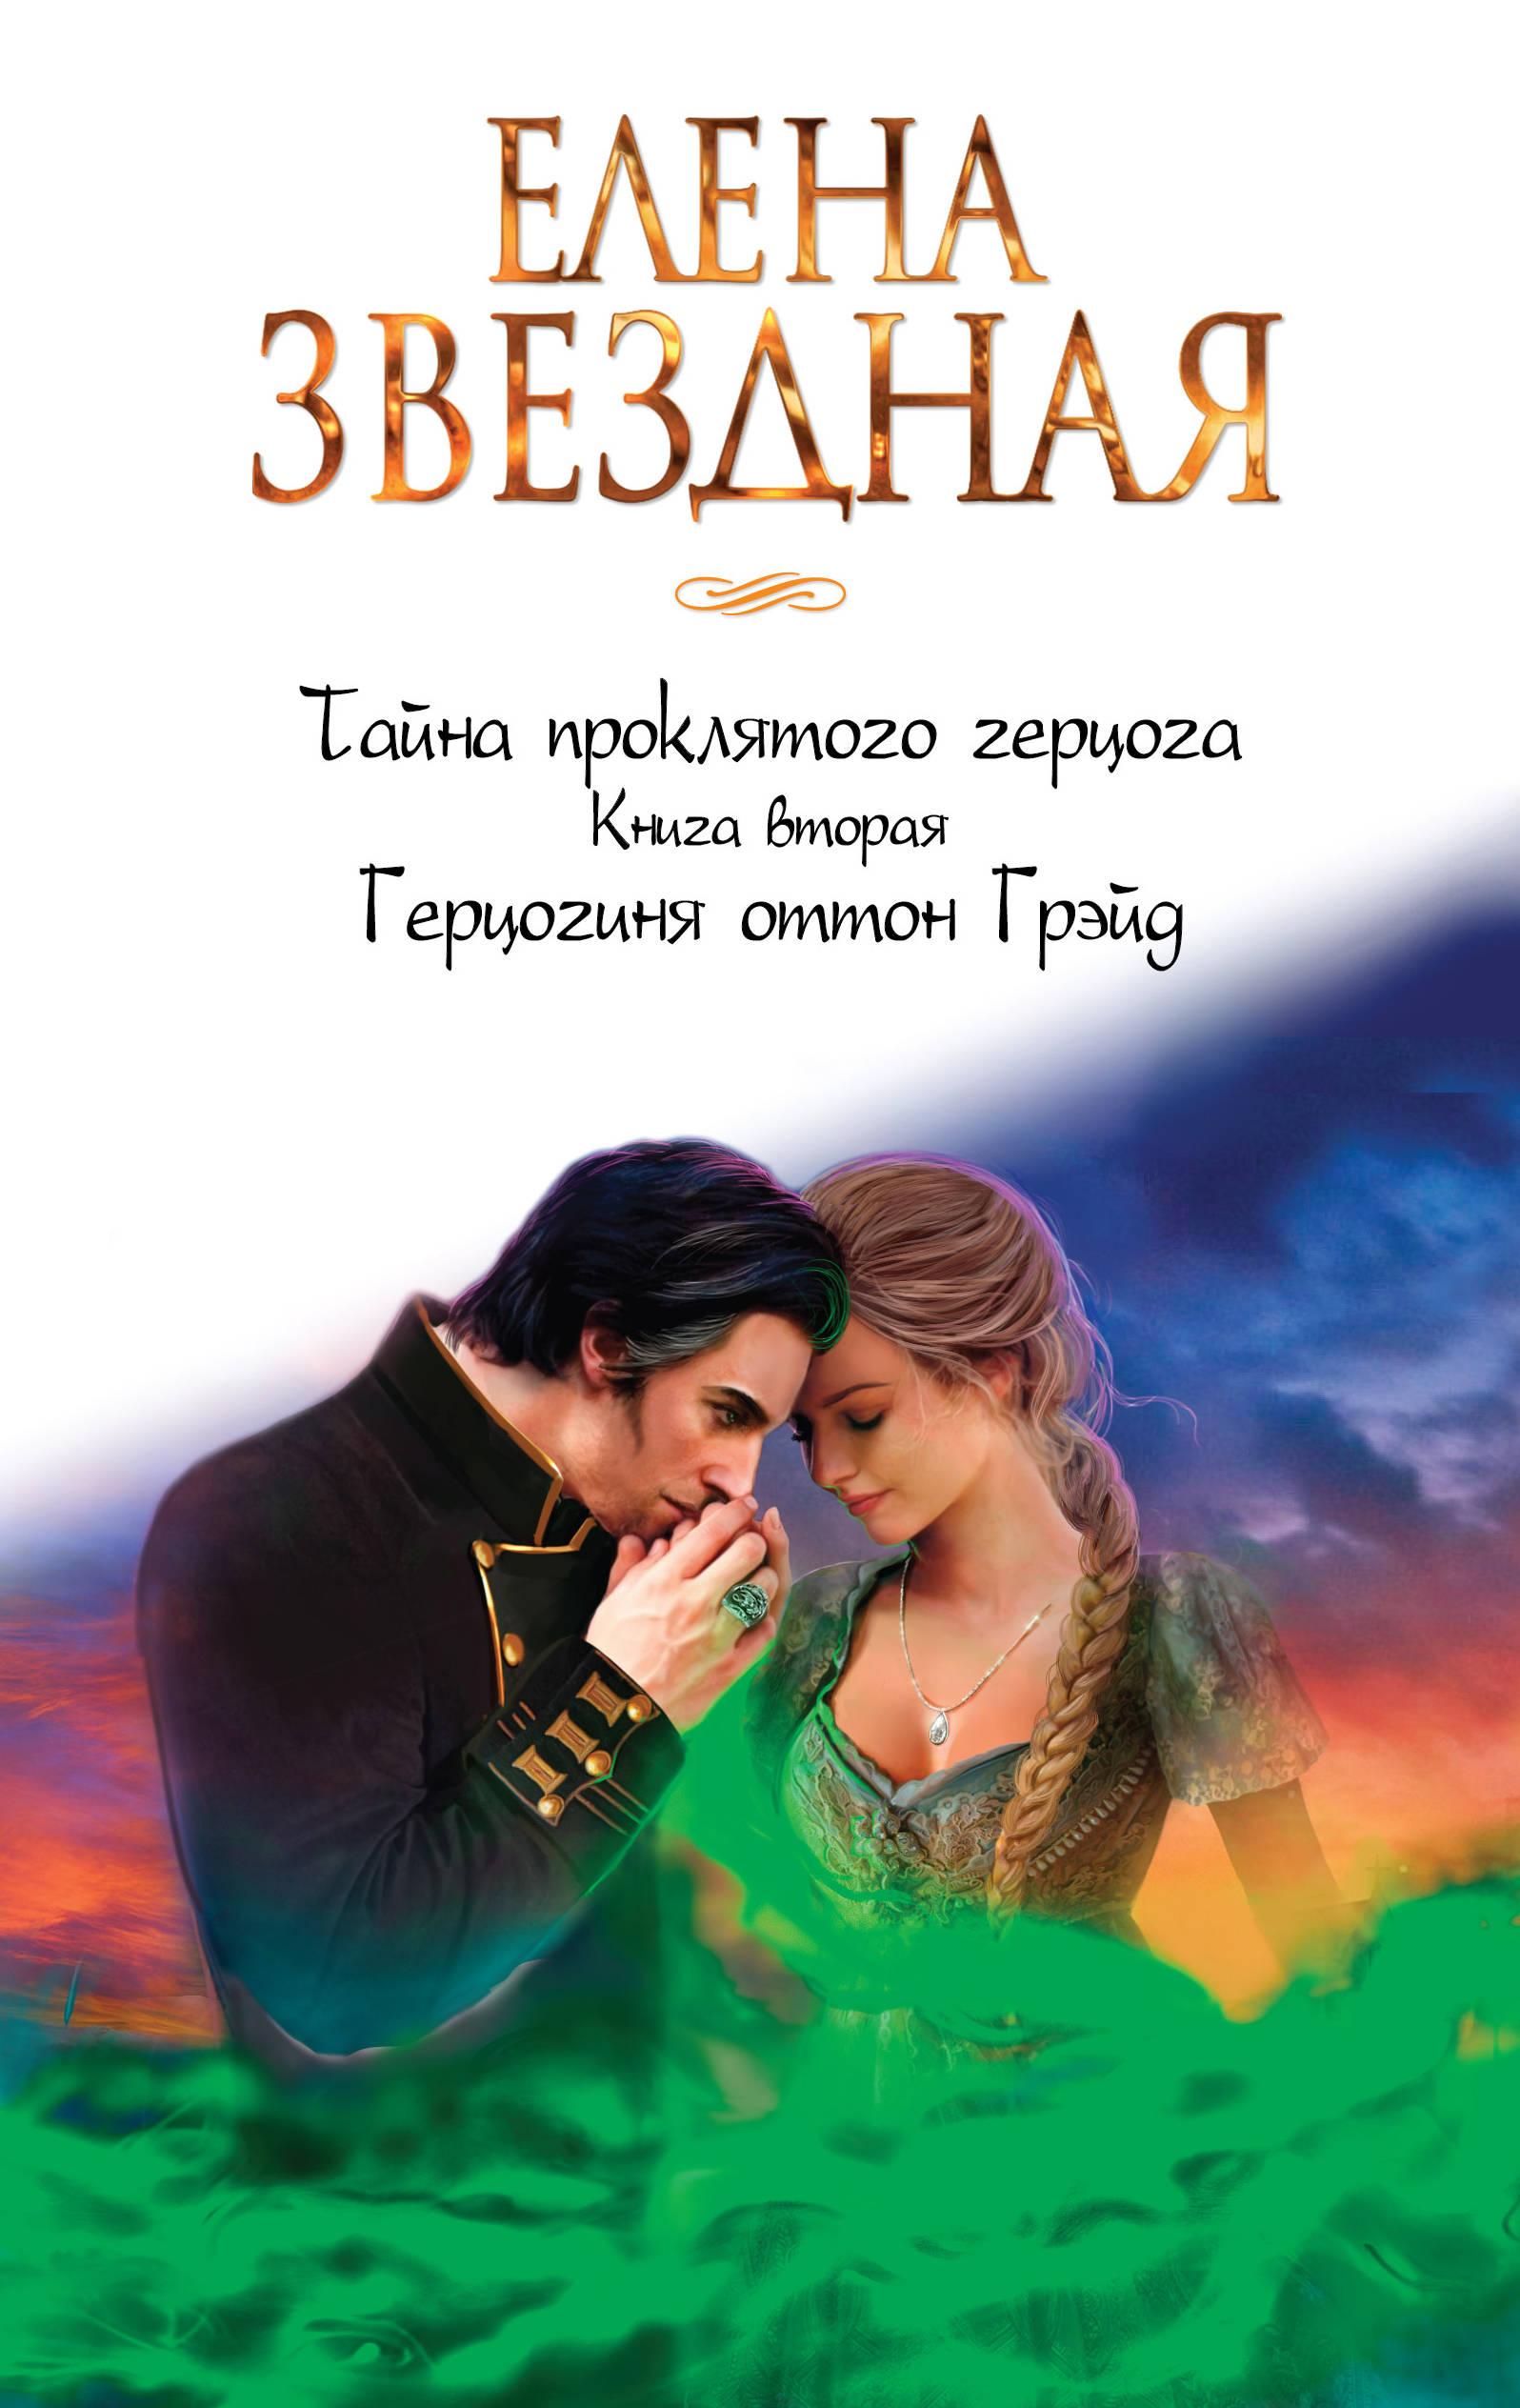 Звездная Елена Тайна проклятого герцога. Книга вторая. Герцогиня оттон Грэйд